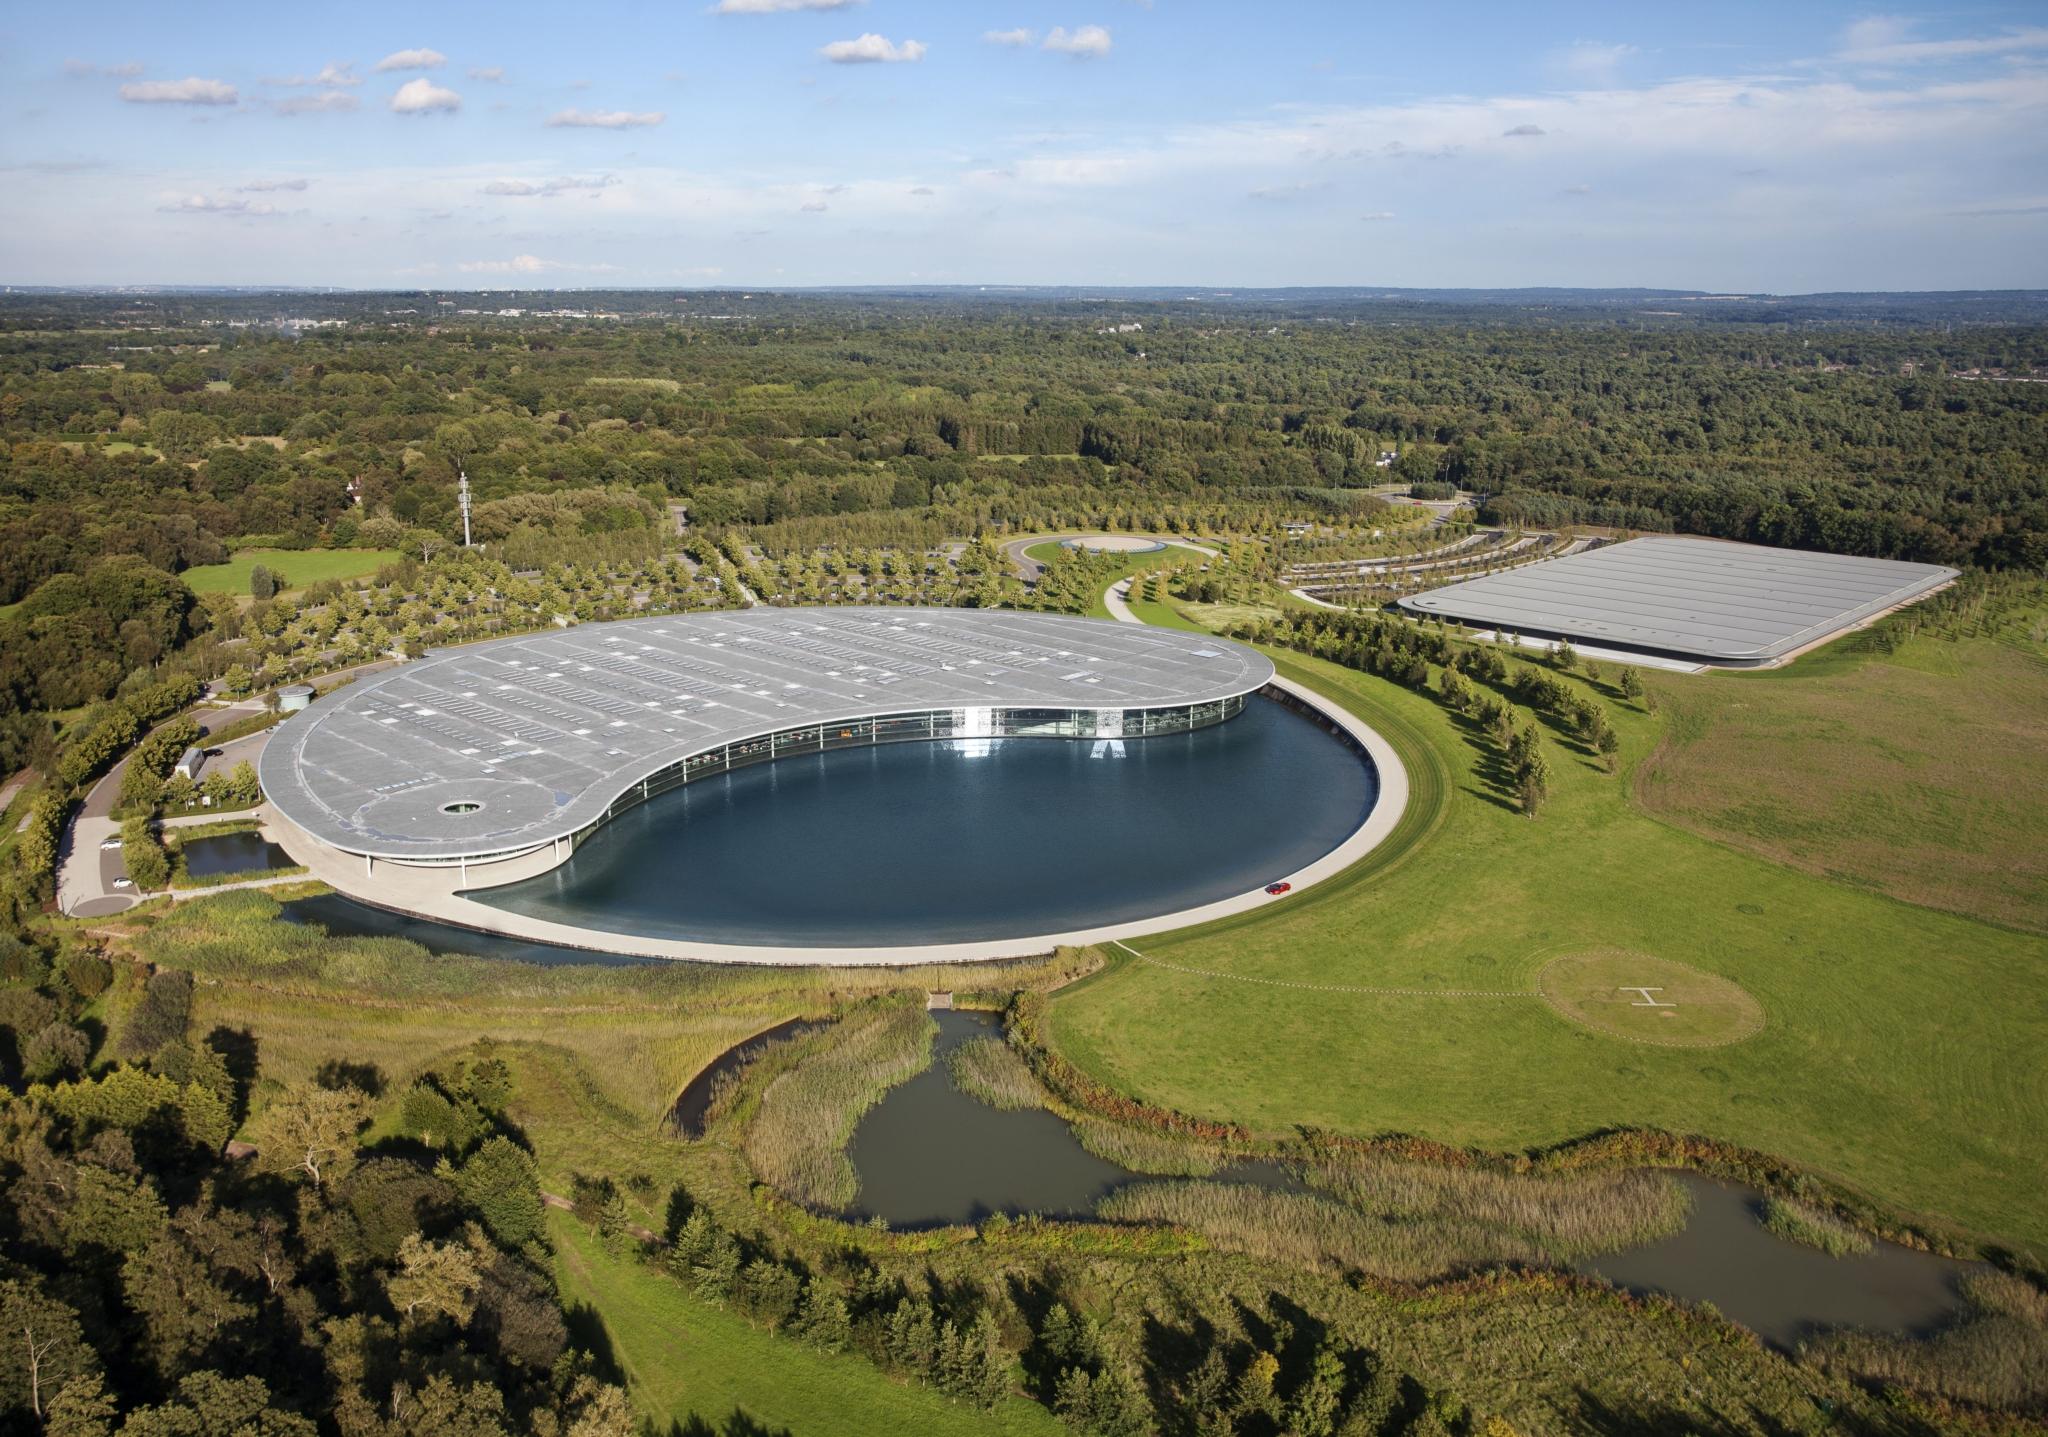 McLaren Group to cut 1200 jobs